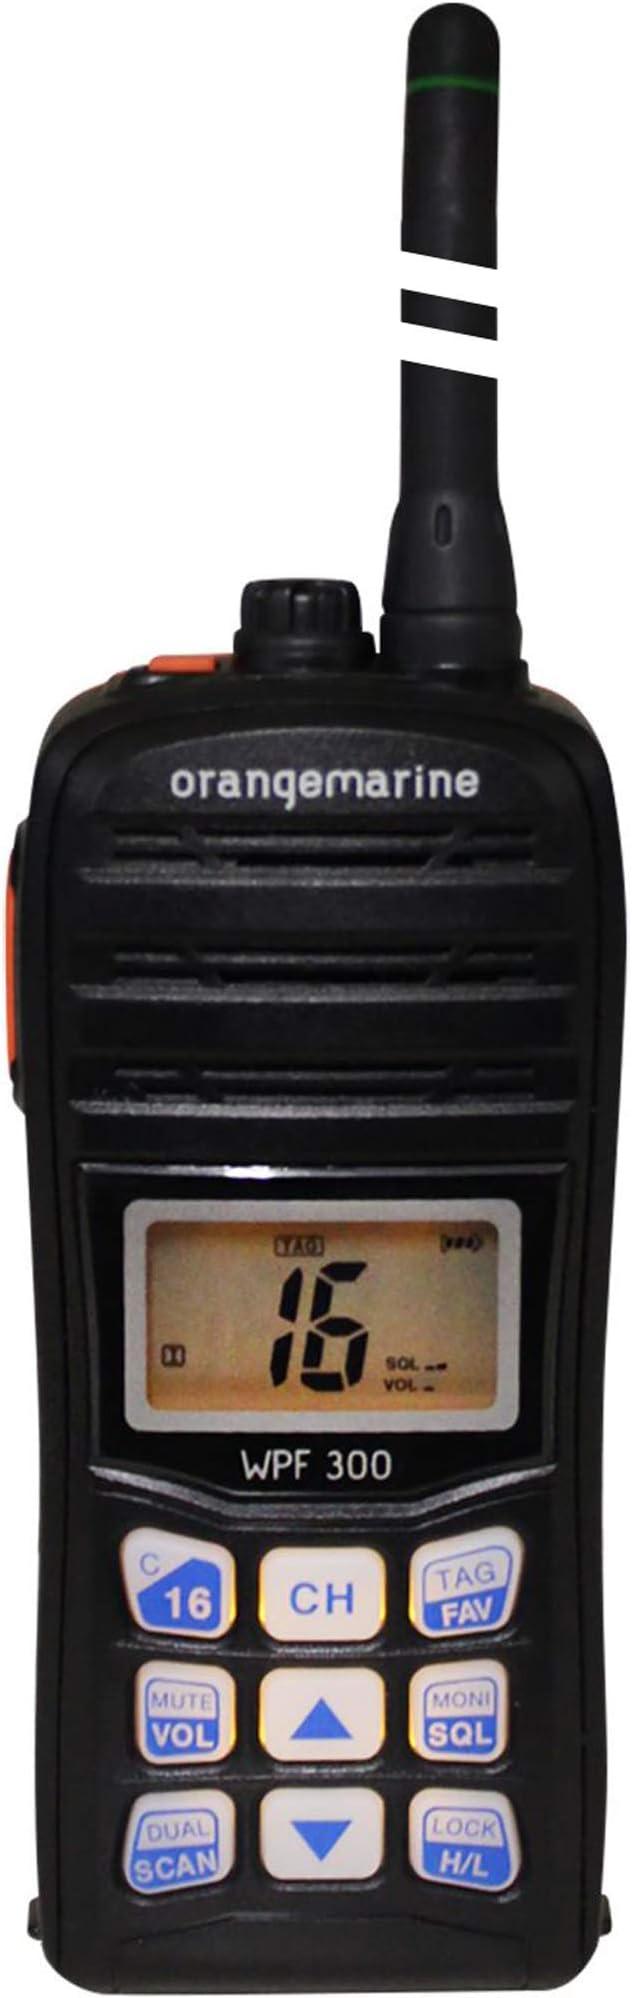 Orangemarine Wpf 300 Portable Waterproof Floating Handheld Vhf Radio Sport Freizeit